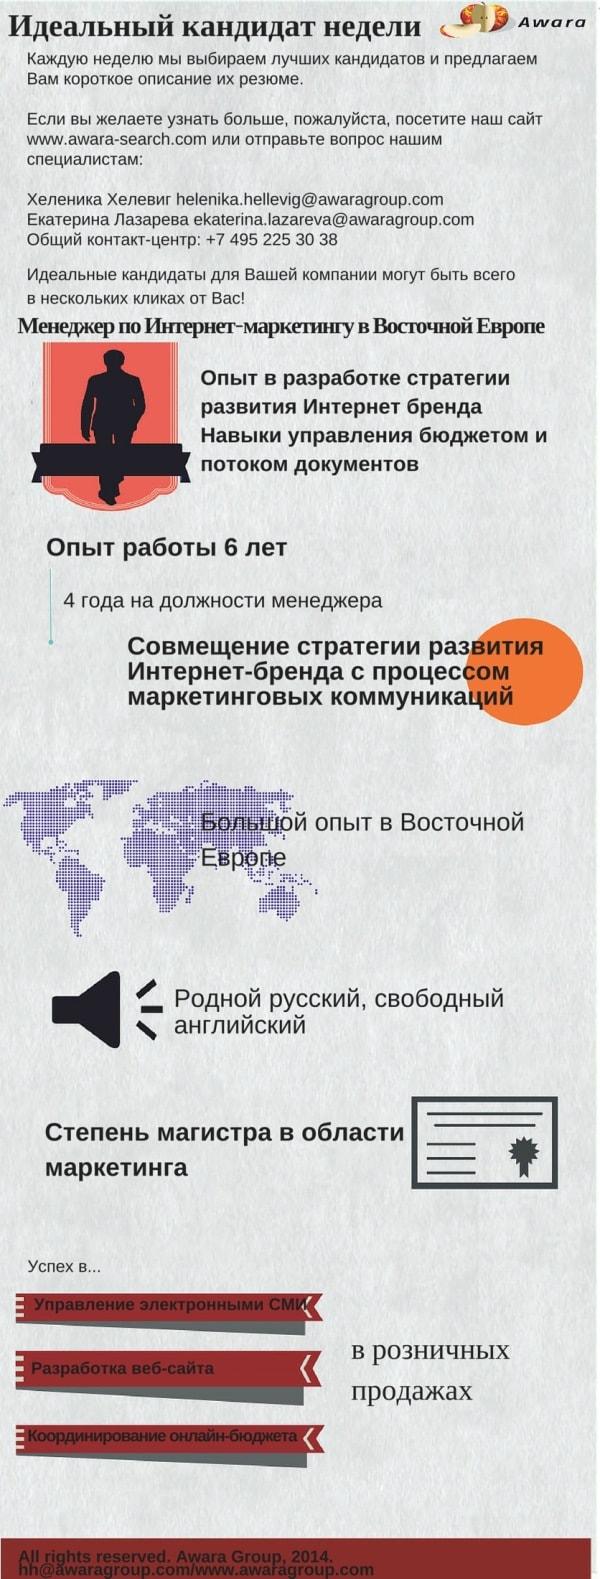 digital-manager-rus-min